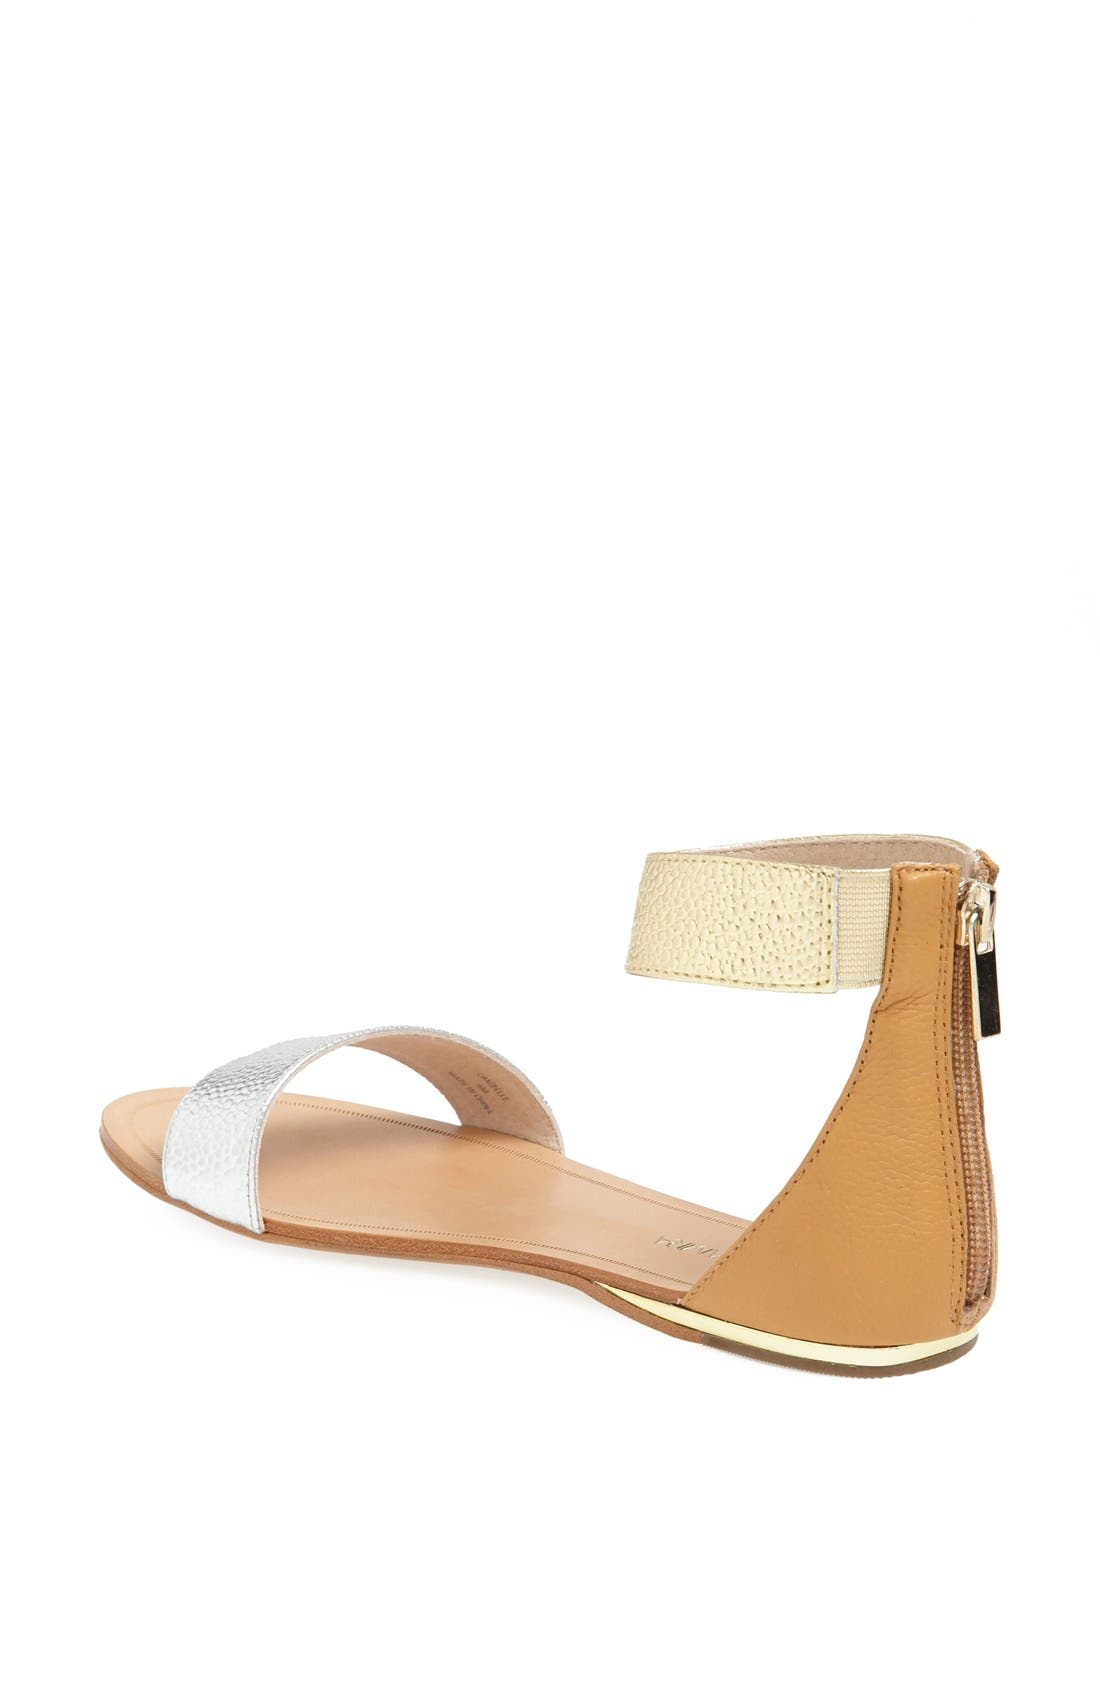 ,                             'Cambelle' Ankle Strap Sandal,                             Alternate thumbnail 11, color,                             040